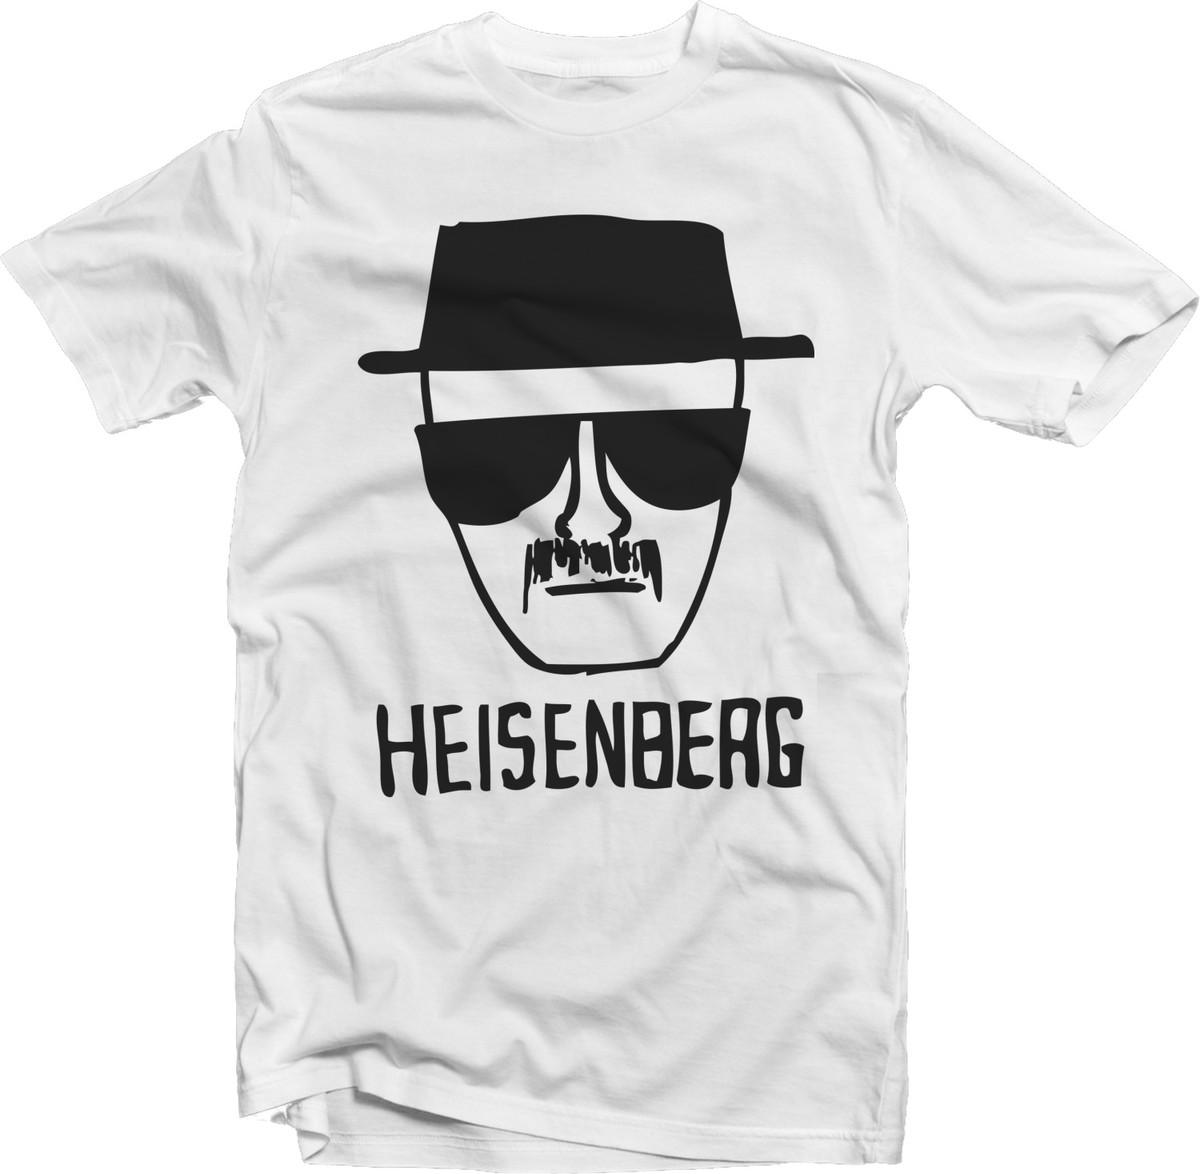 254429524 Camiseta Série Breaking Bad Heisenberg Branca 01 no Elo7